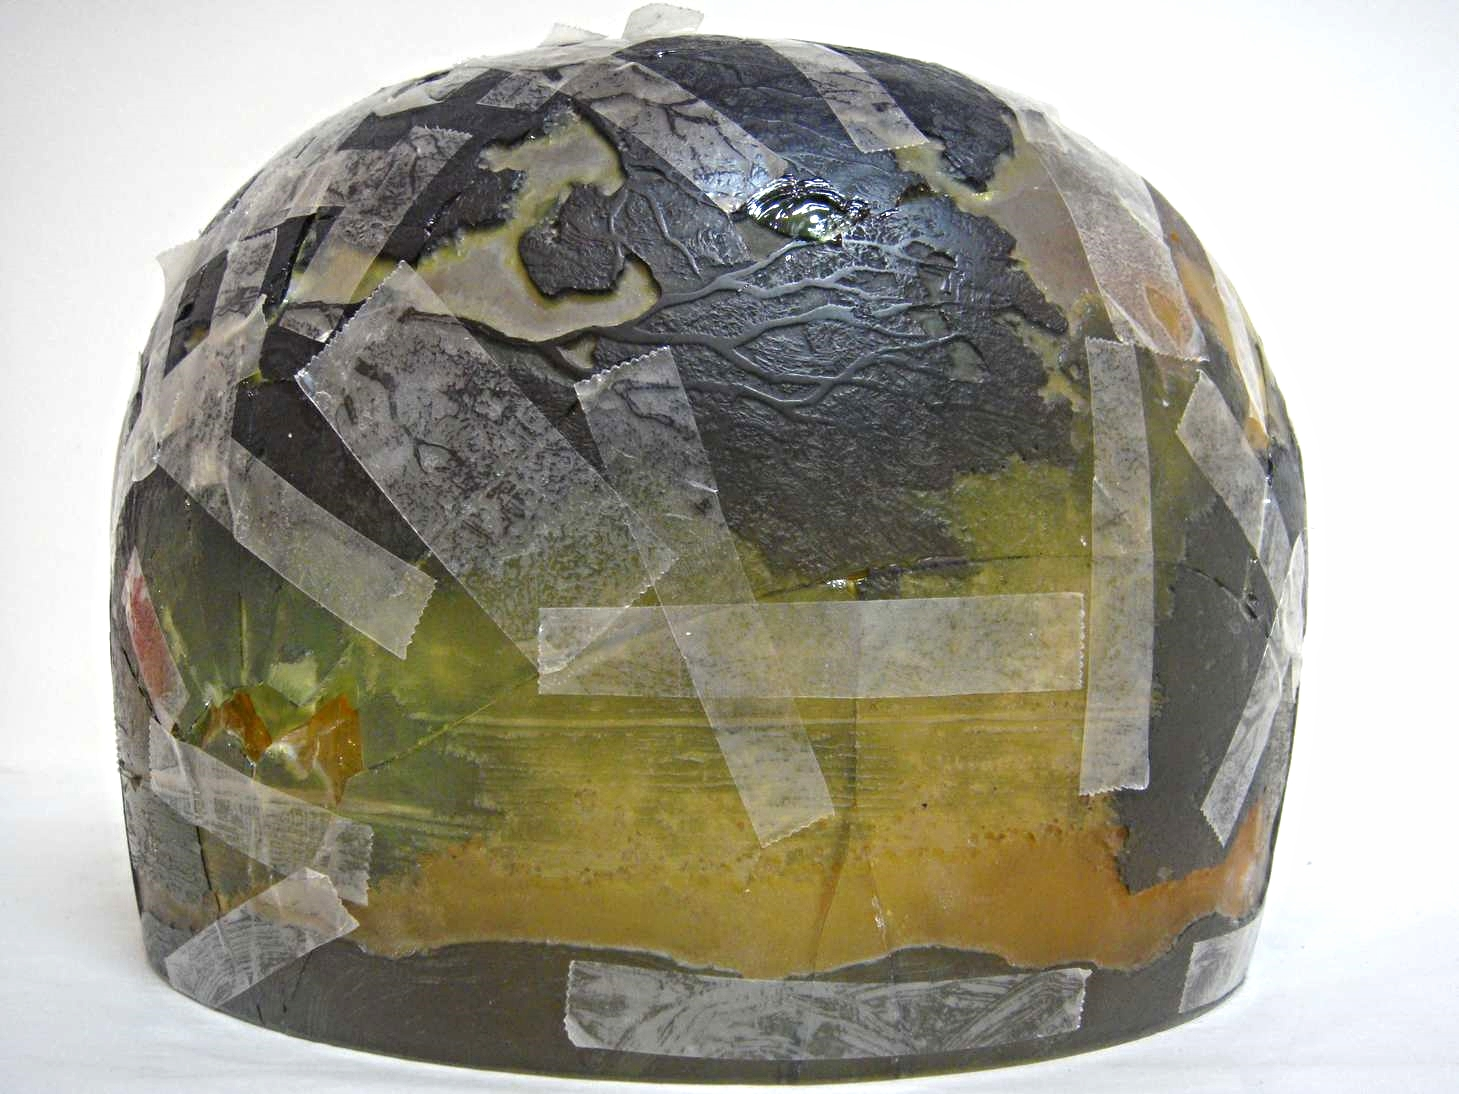 globe-abat-jour-legras-pate-verre-1930-art-restauration-reparation-restaurarte.jpg